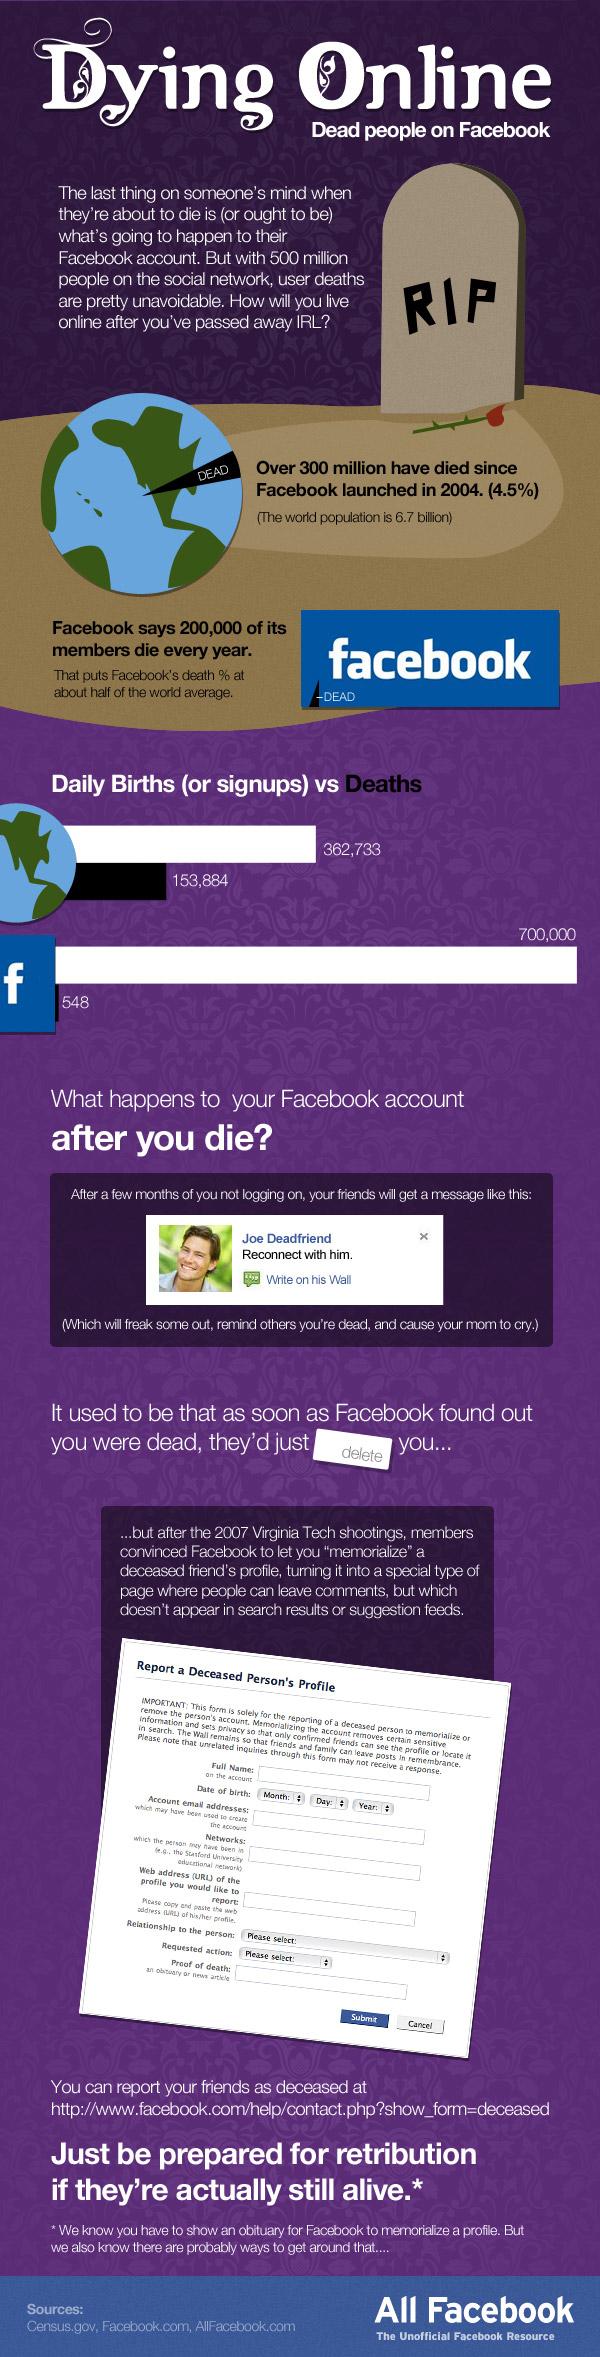 AllFacebook-death-on-facebook